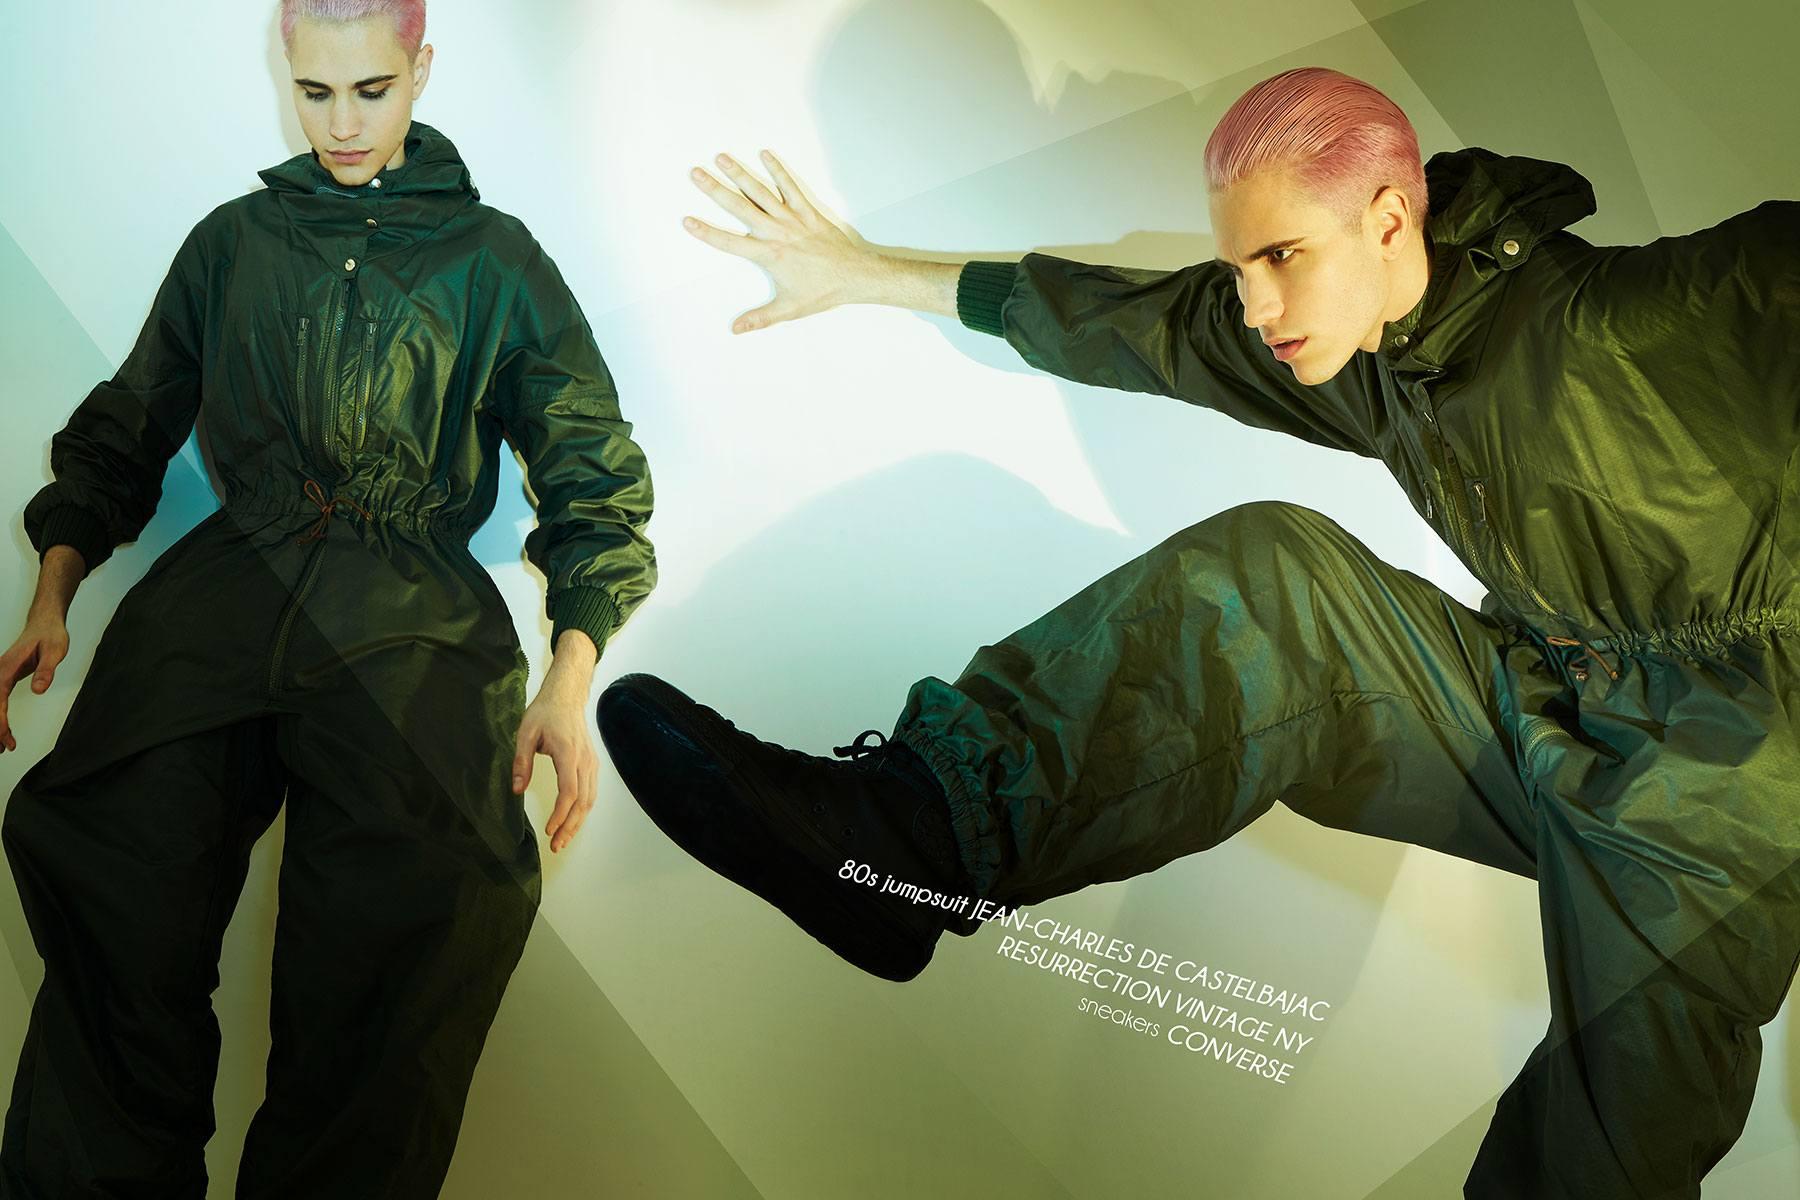 Model Austin Kairis photographed by Alexander Thompson for Ponyboy magazine.